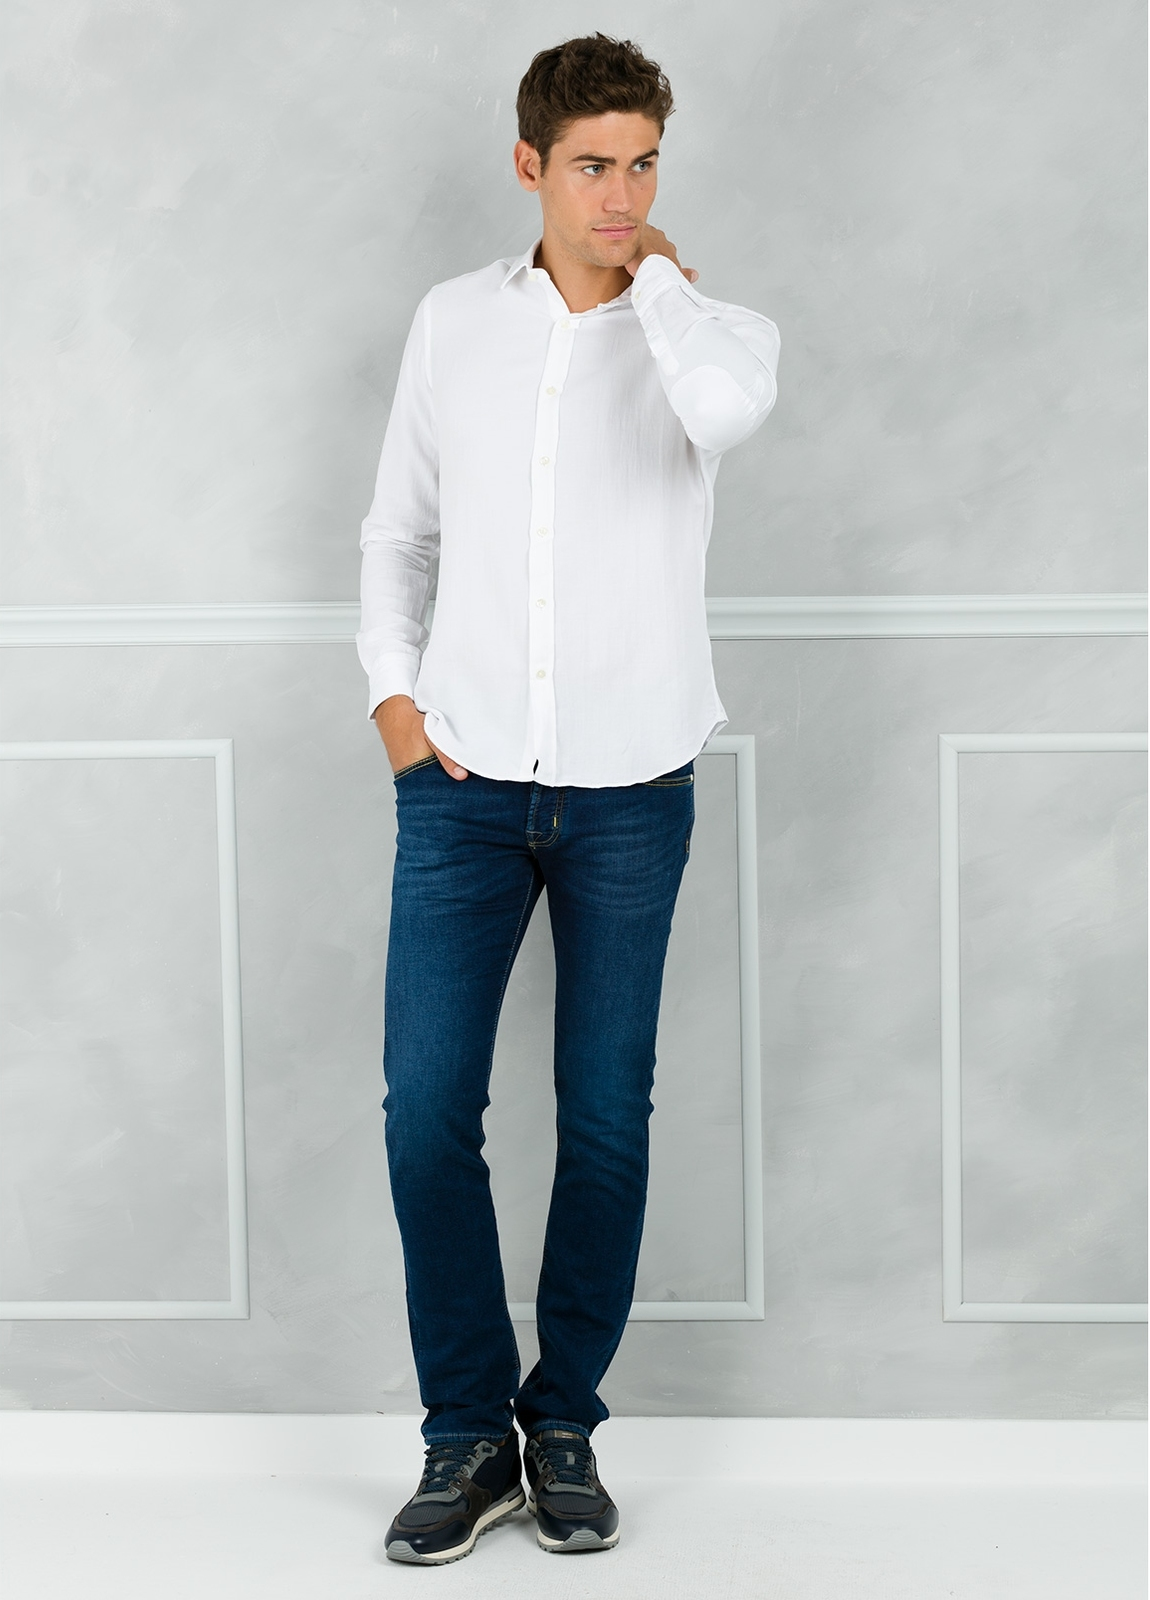 Camisa Leisure Wear REGULAR FIT modelo PORTO color blanco. 100% Algodón.